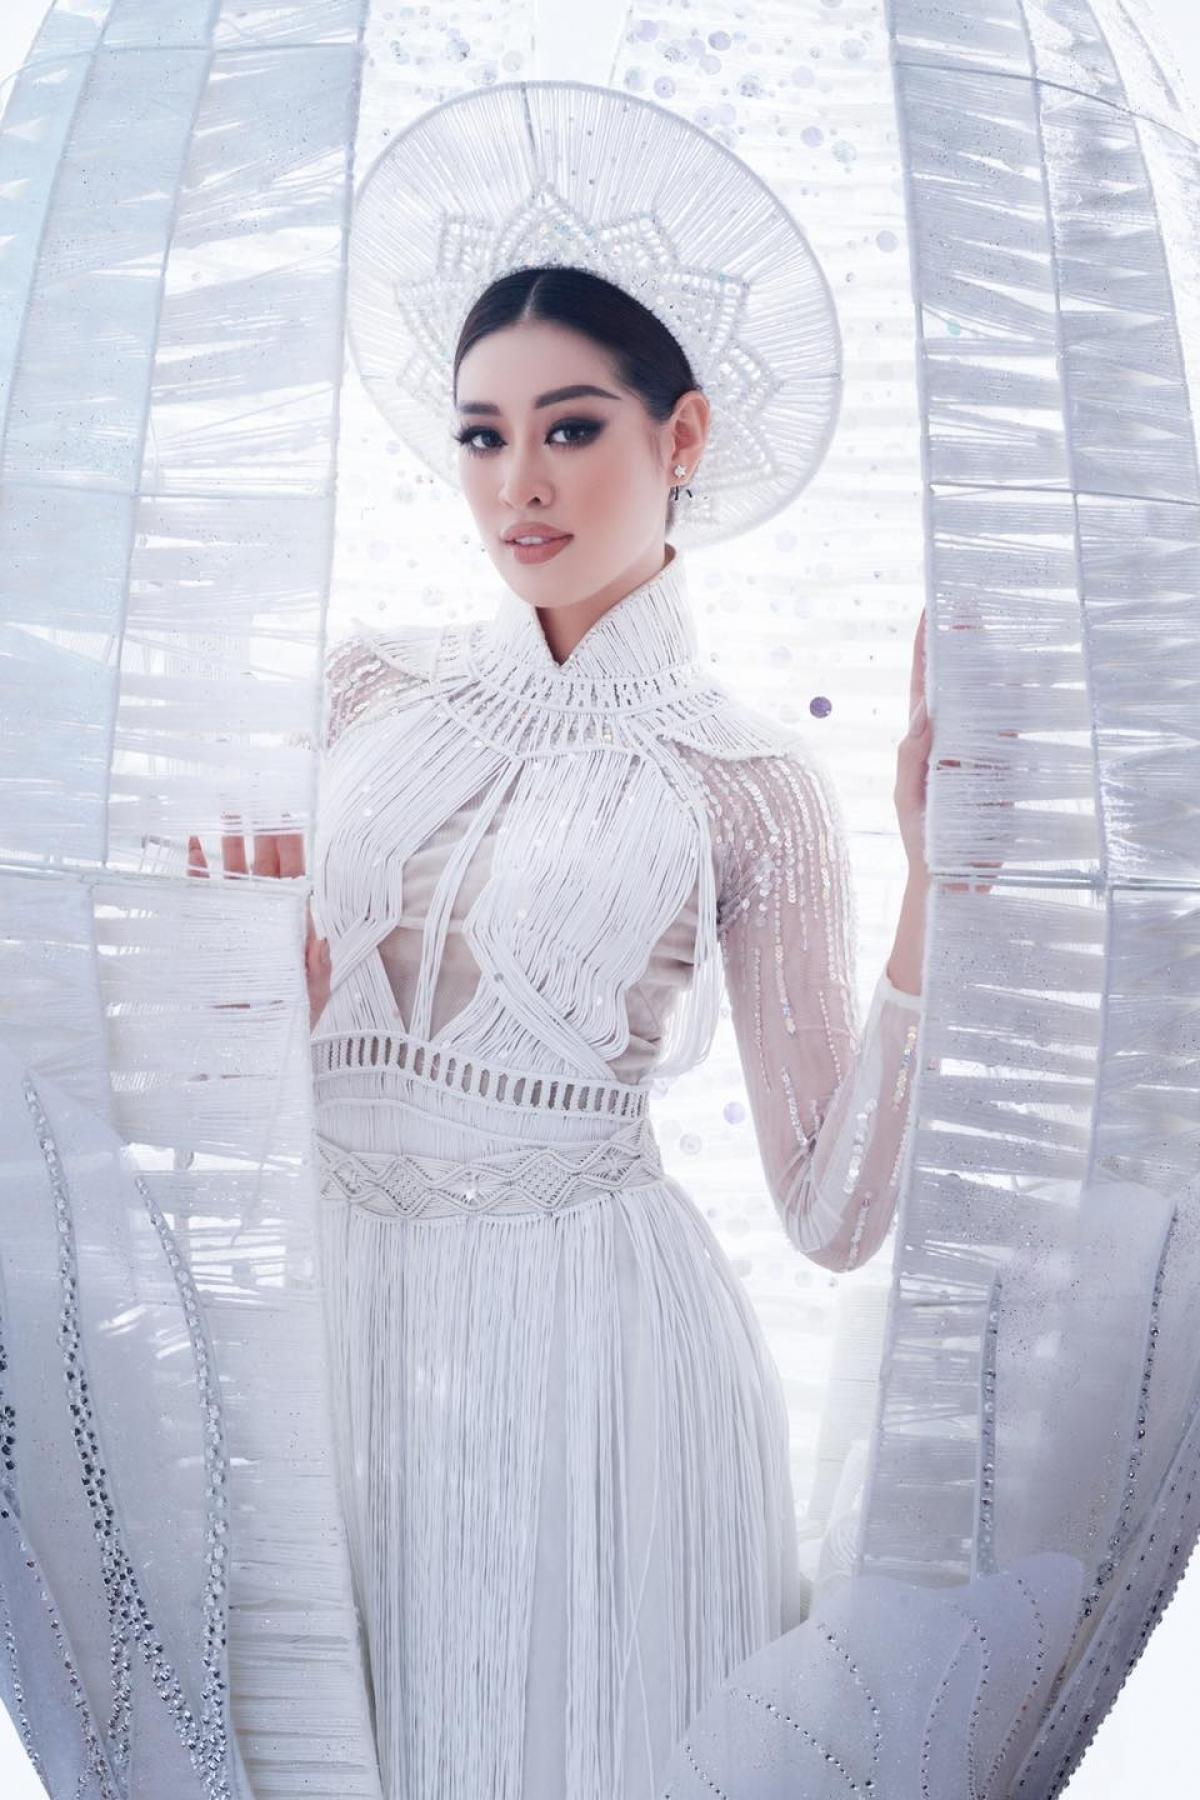 Khanh Van is named among the Top 20 of Miss Grand Slam 2020.